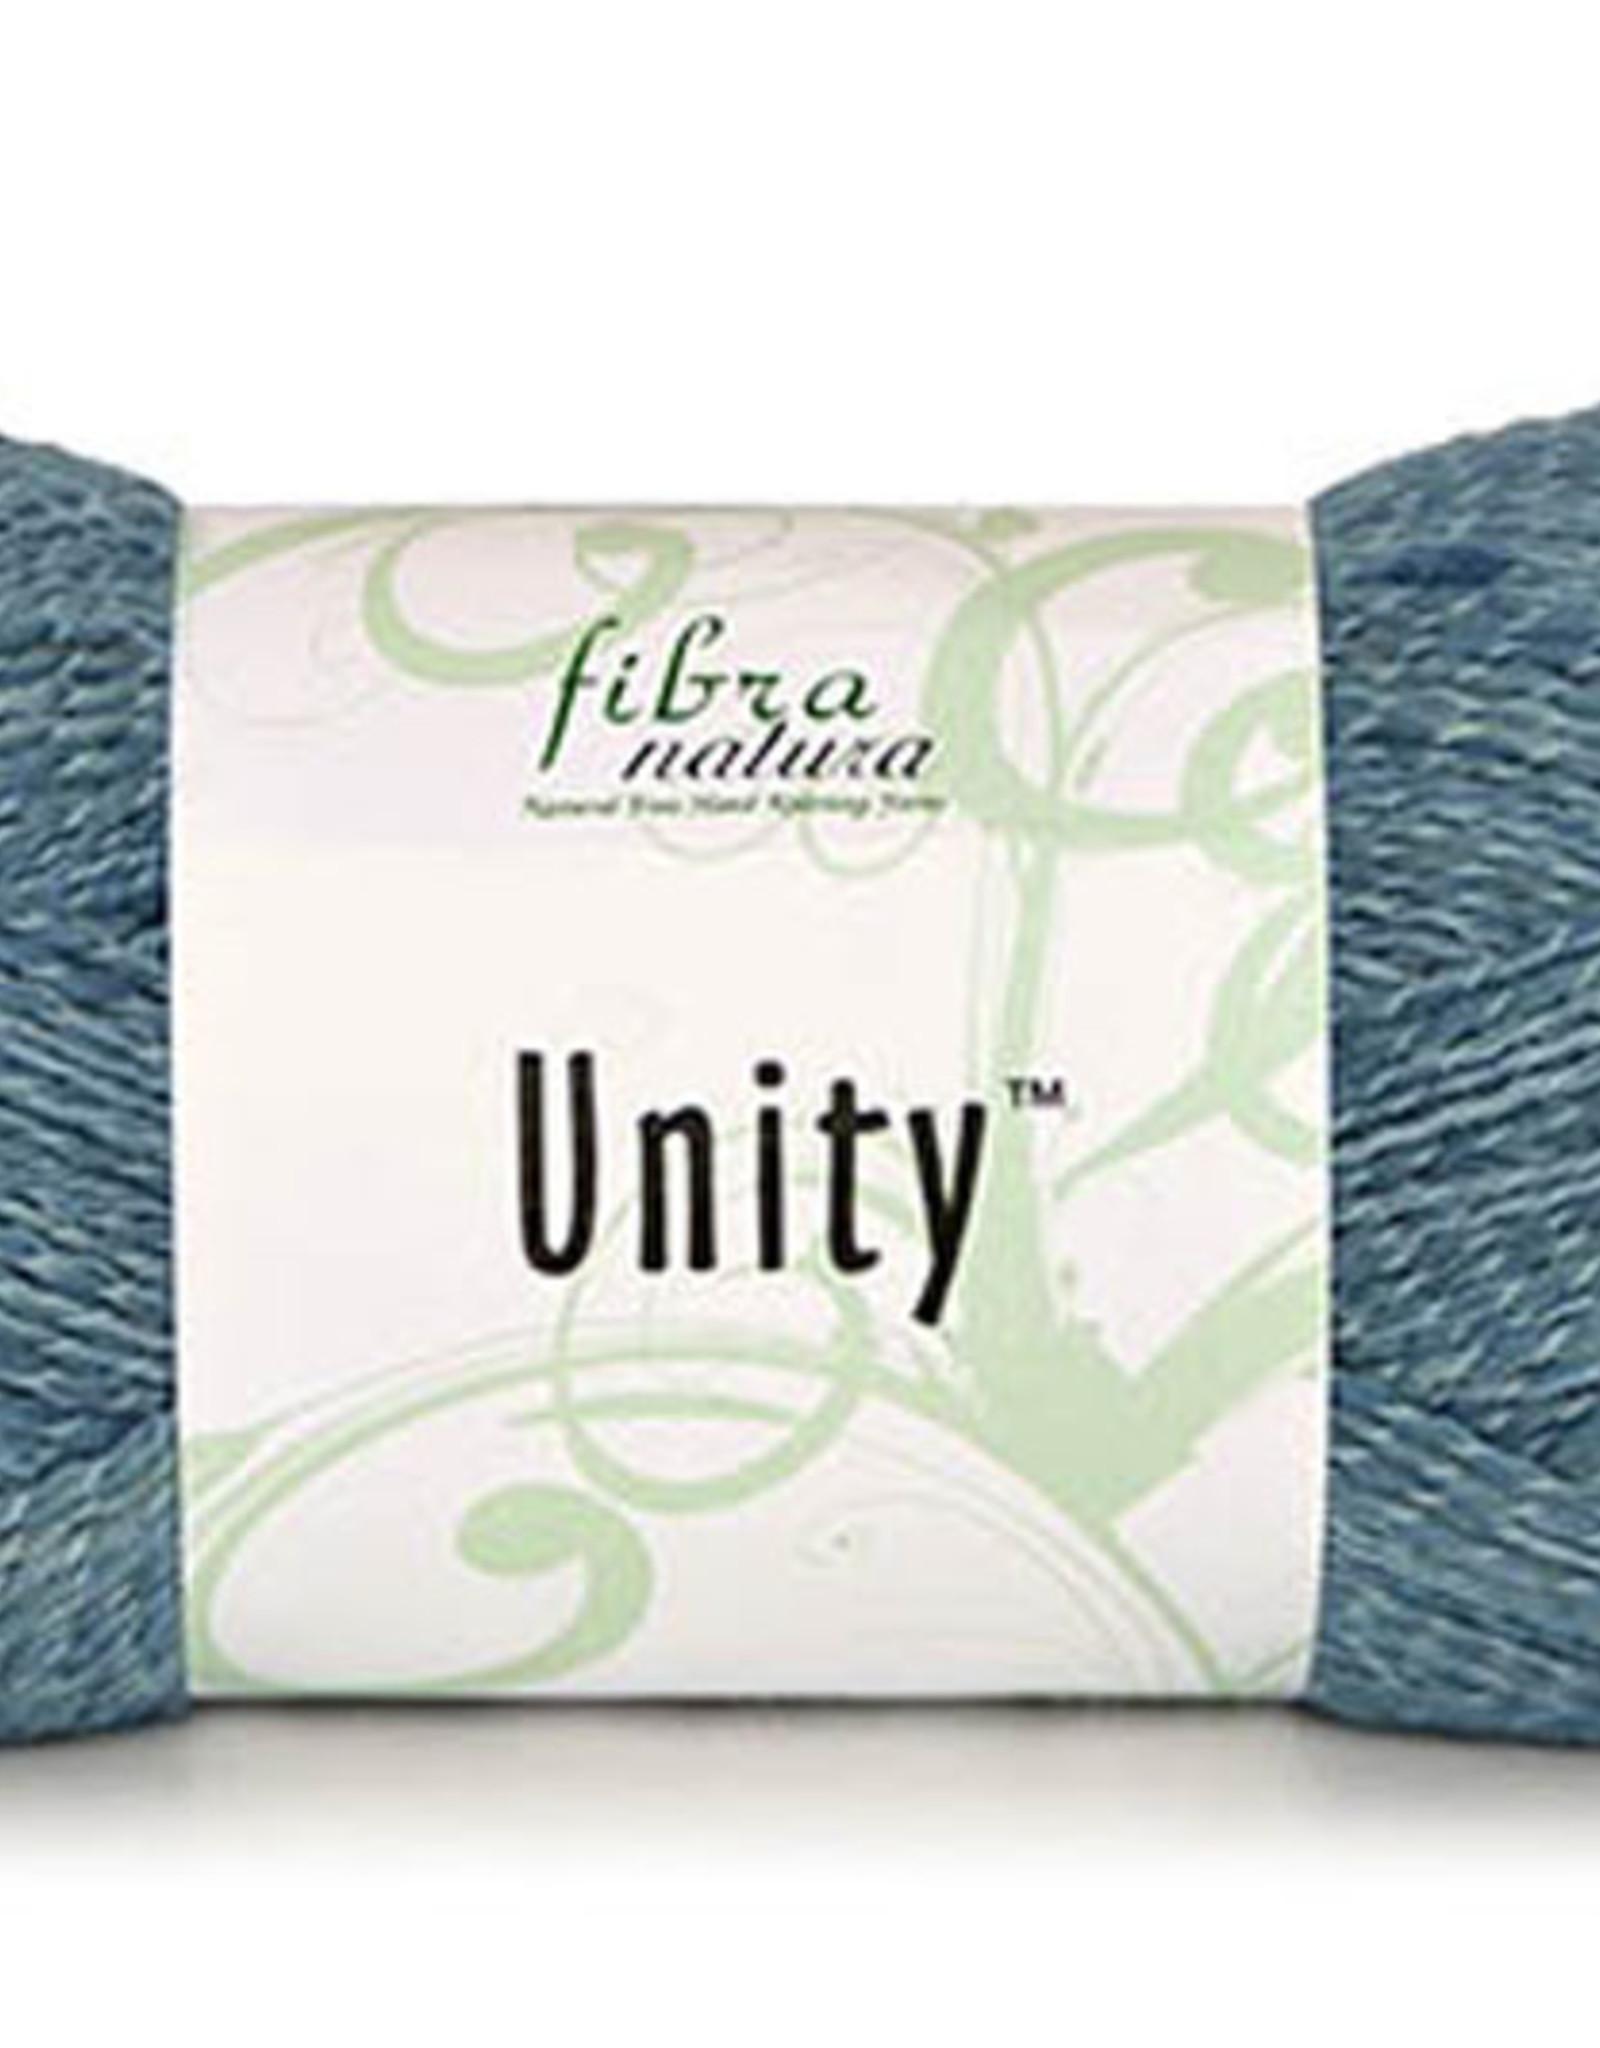 Fibra Natura Unity